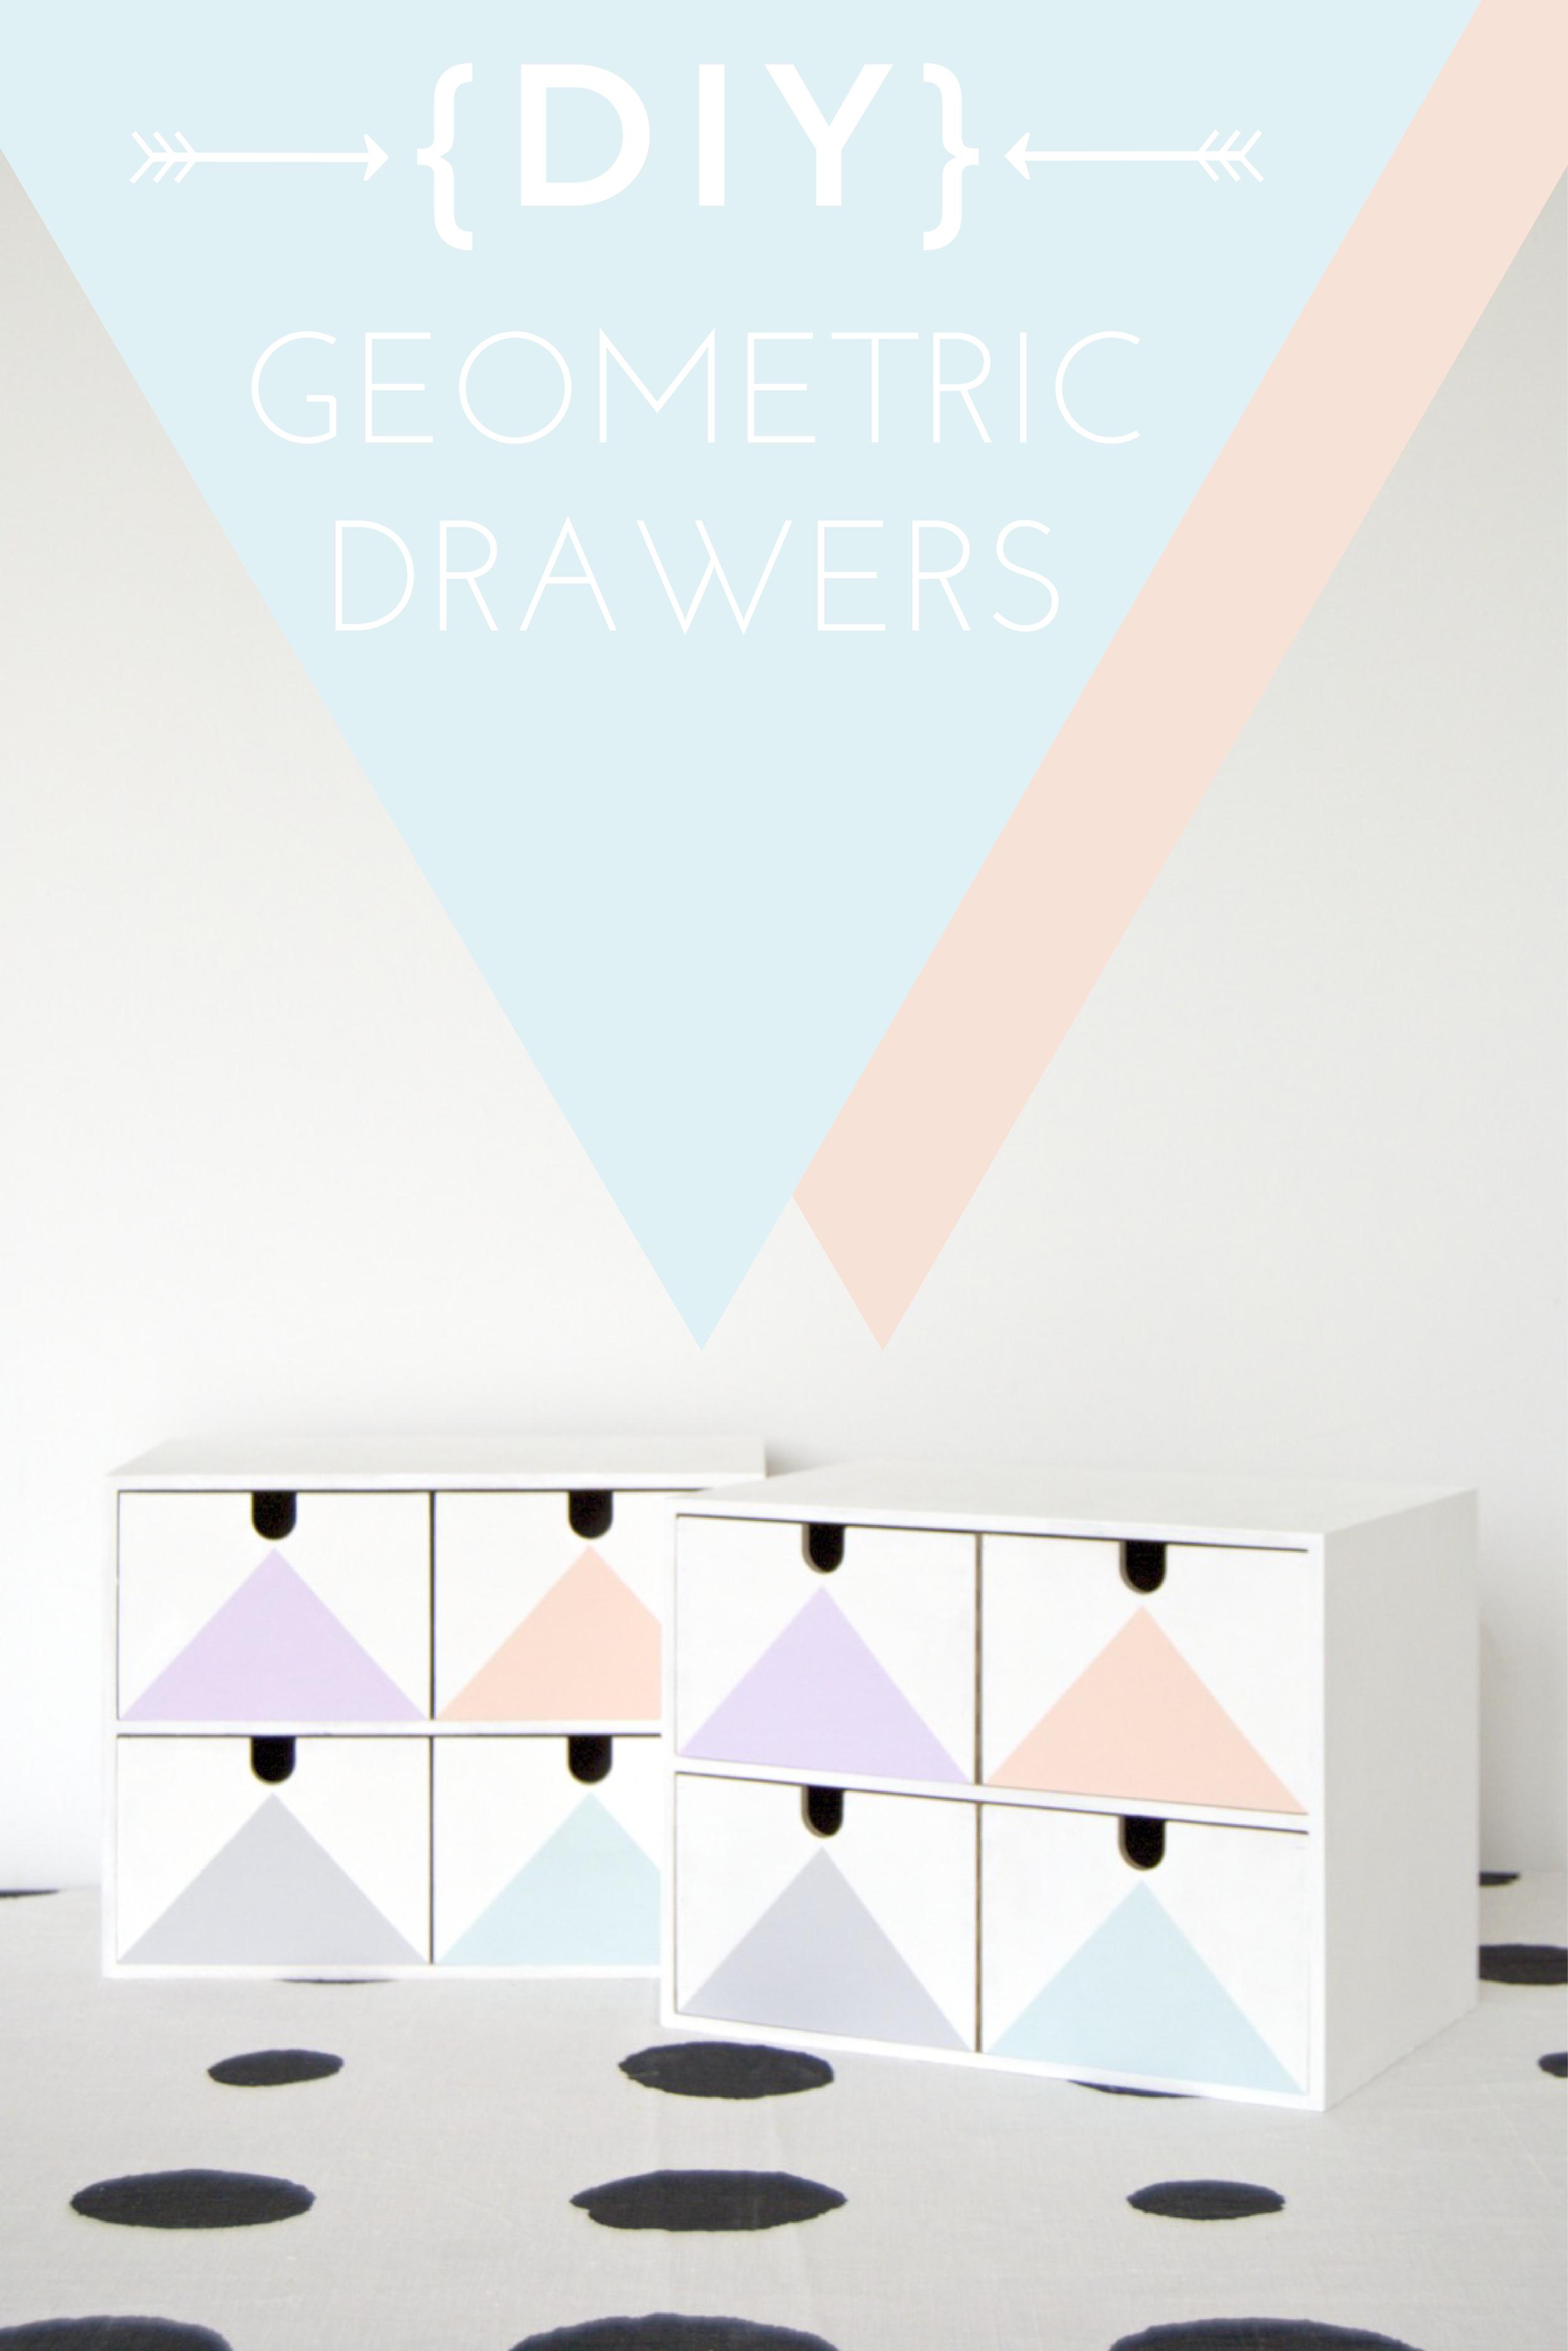 geometricdarwers-01.png